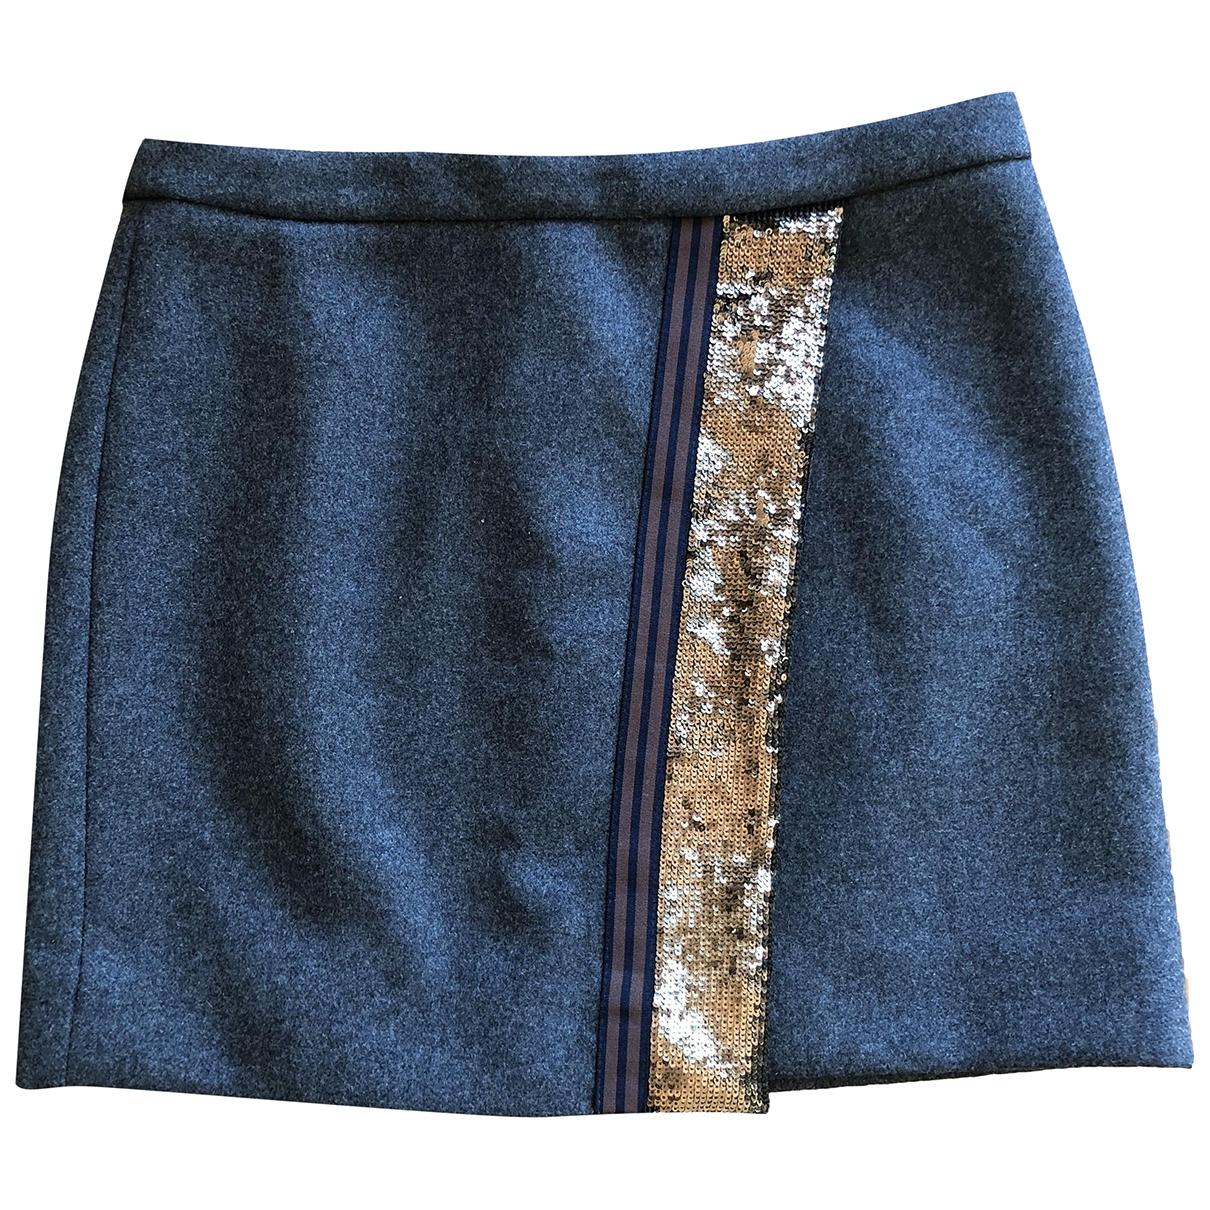 J.crew \N Anthracite Wool skirt for Women 4 US